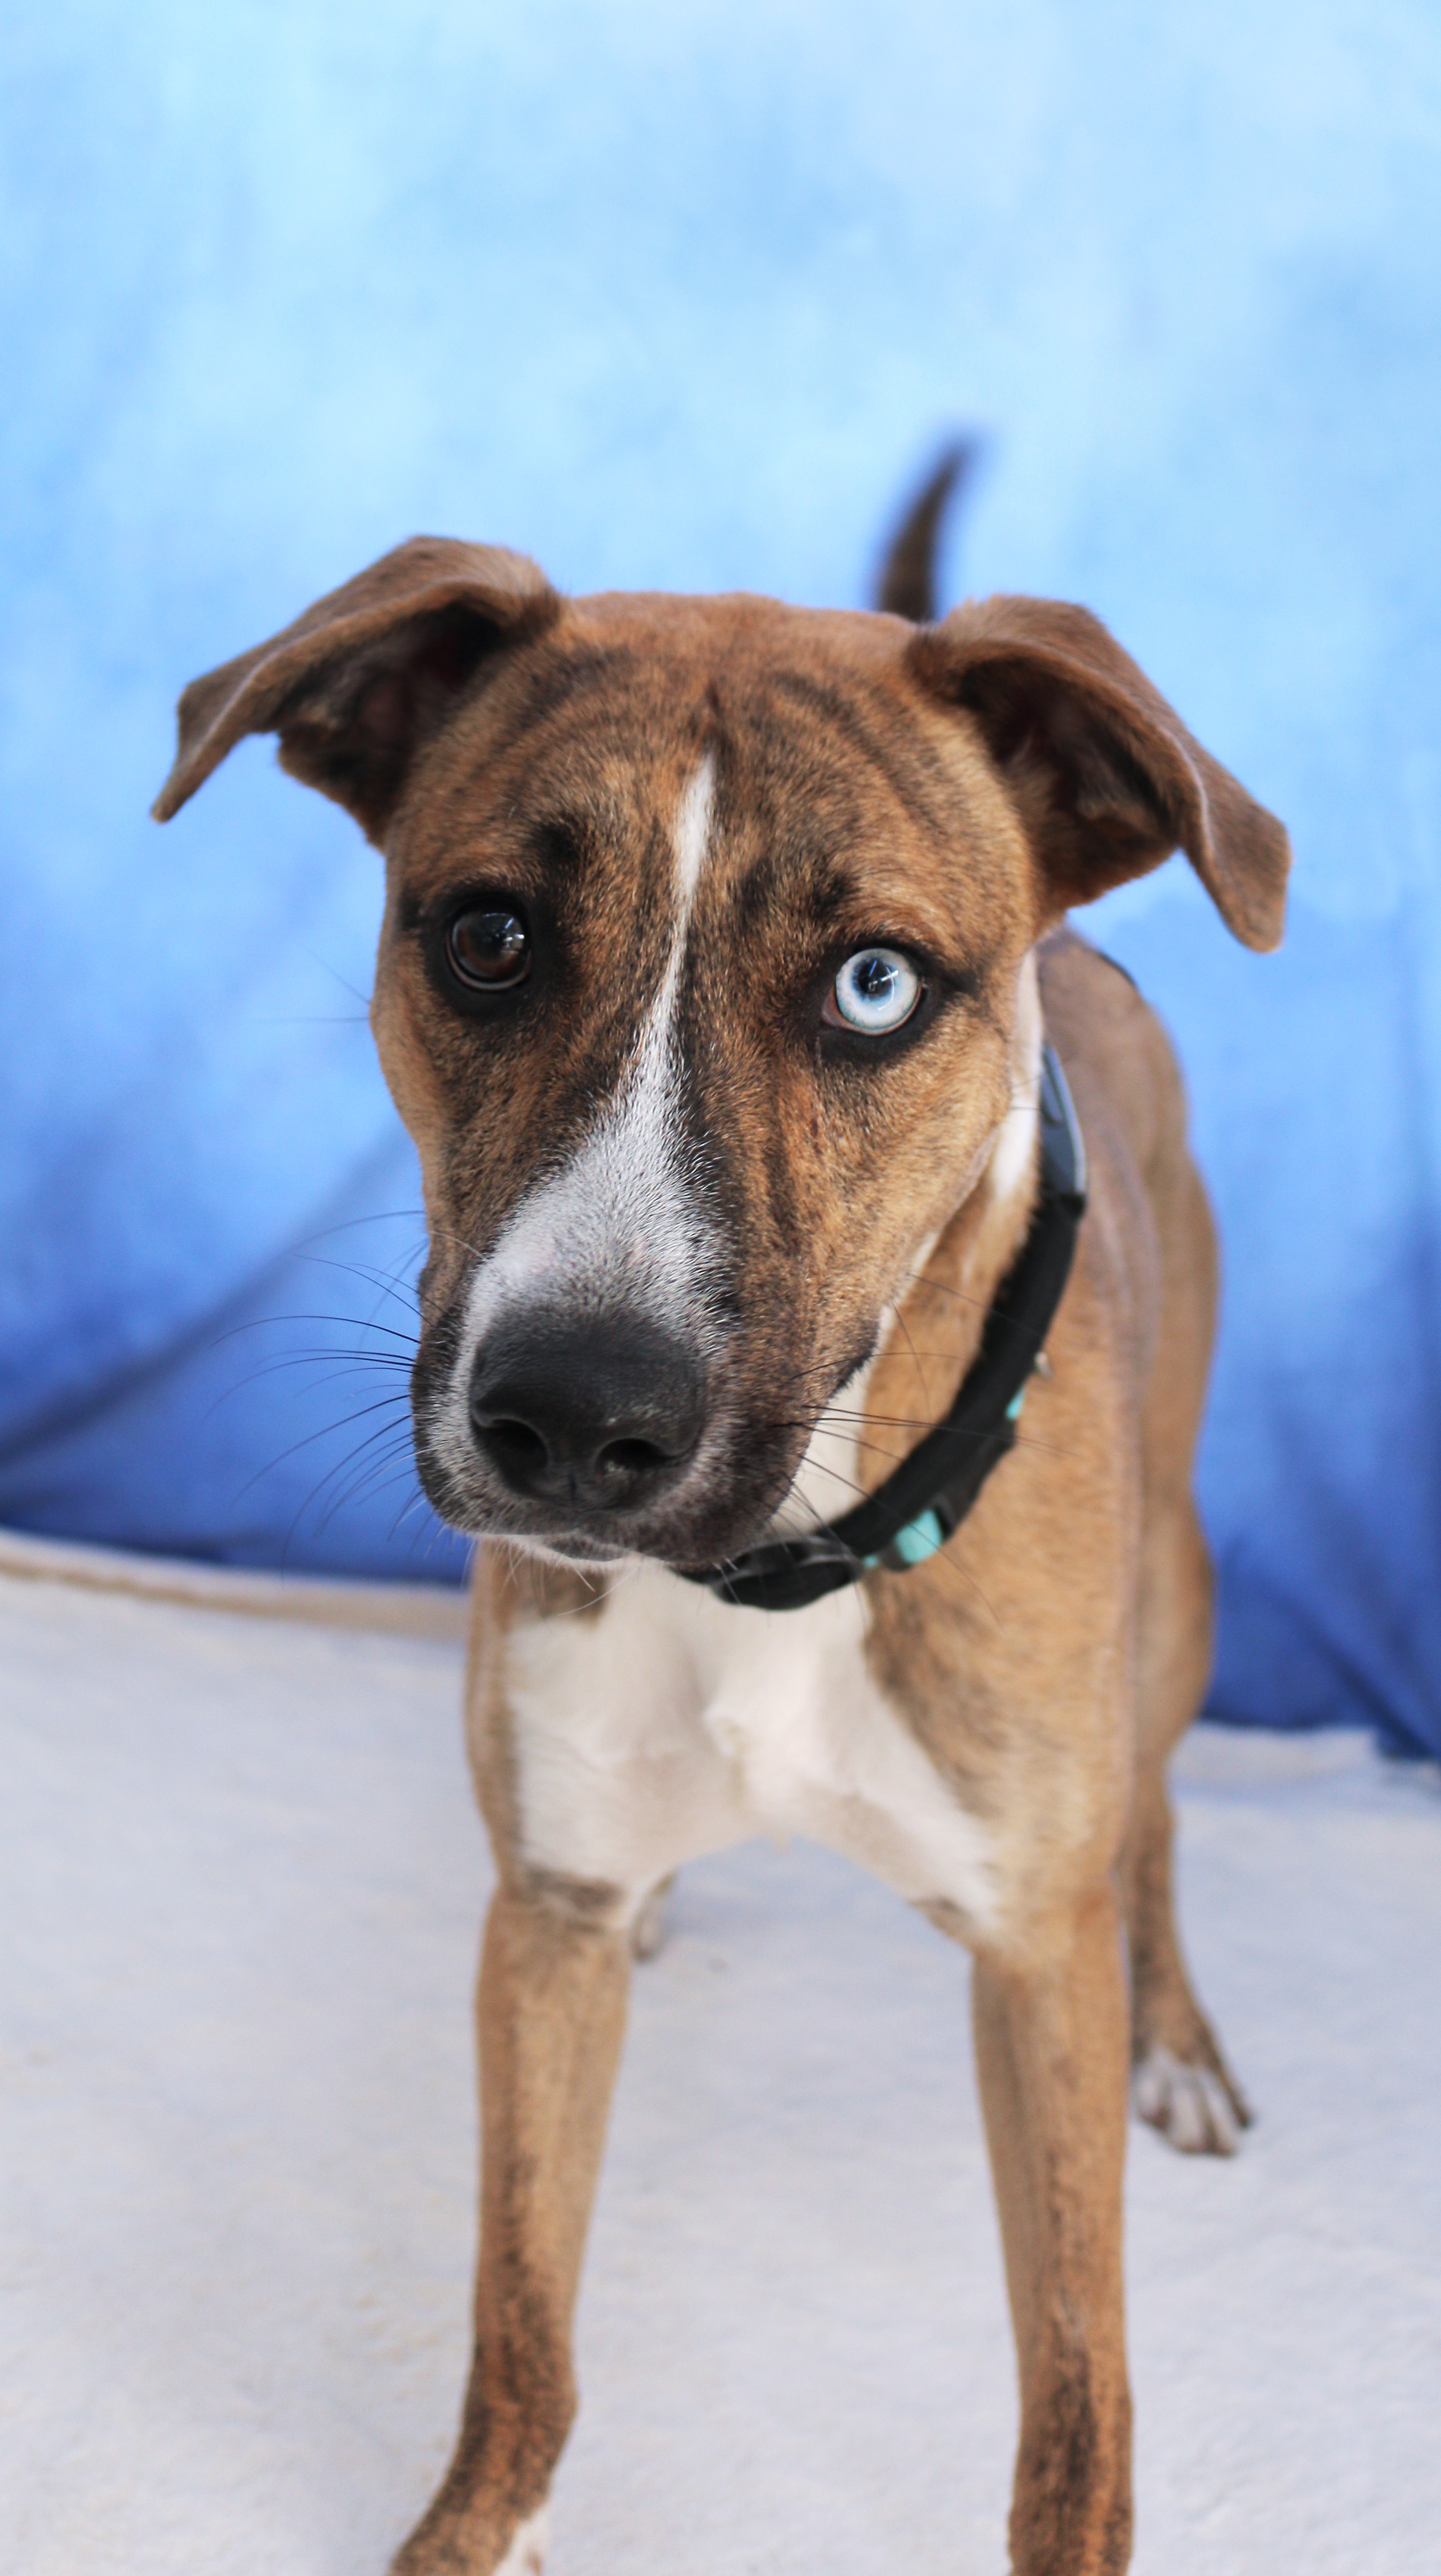 Rancho Coastal Humane Society – Dedicated to the rescue and